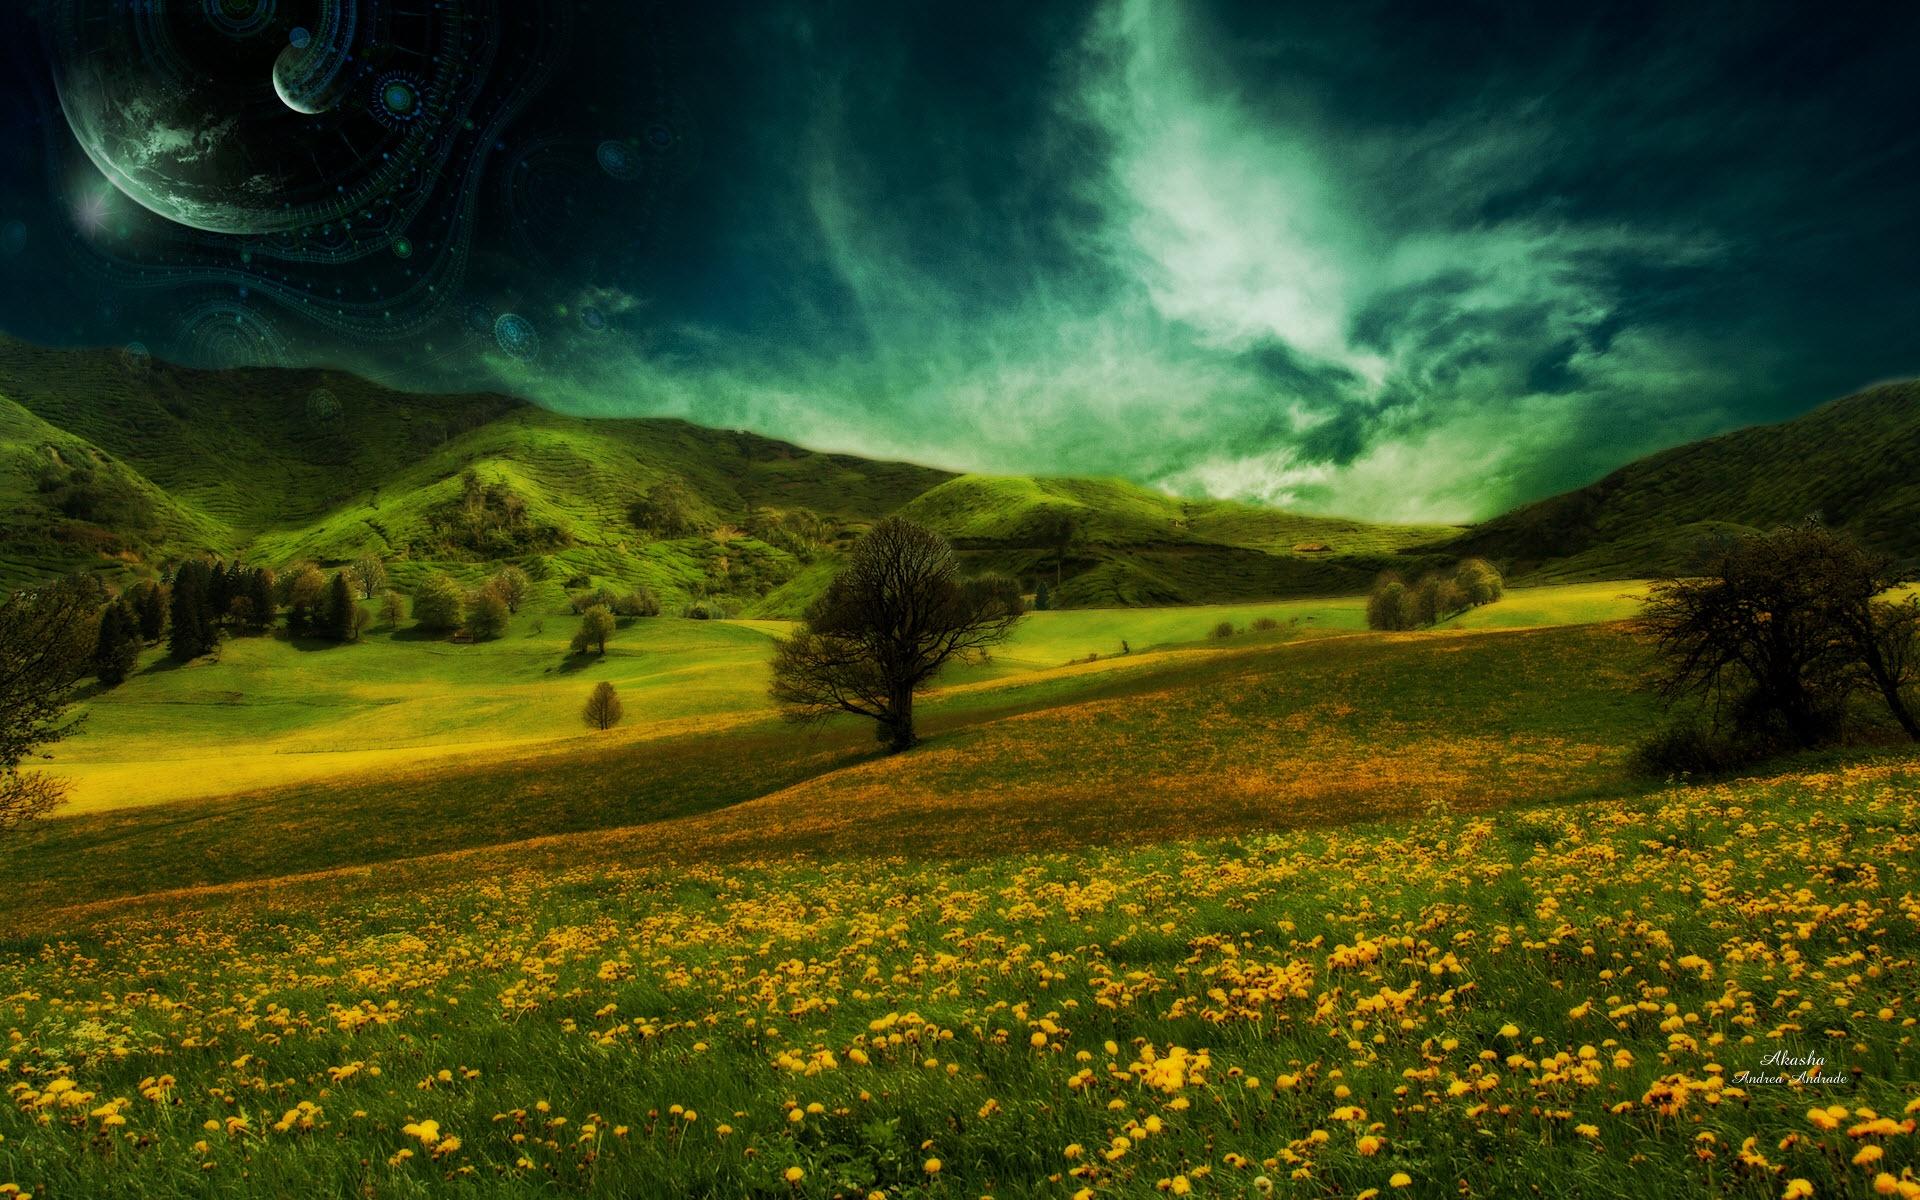 Landscape Hd Wallpapers 1080p: Full HD Desktop Wallpapers 1080p